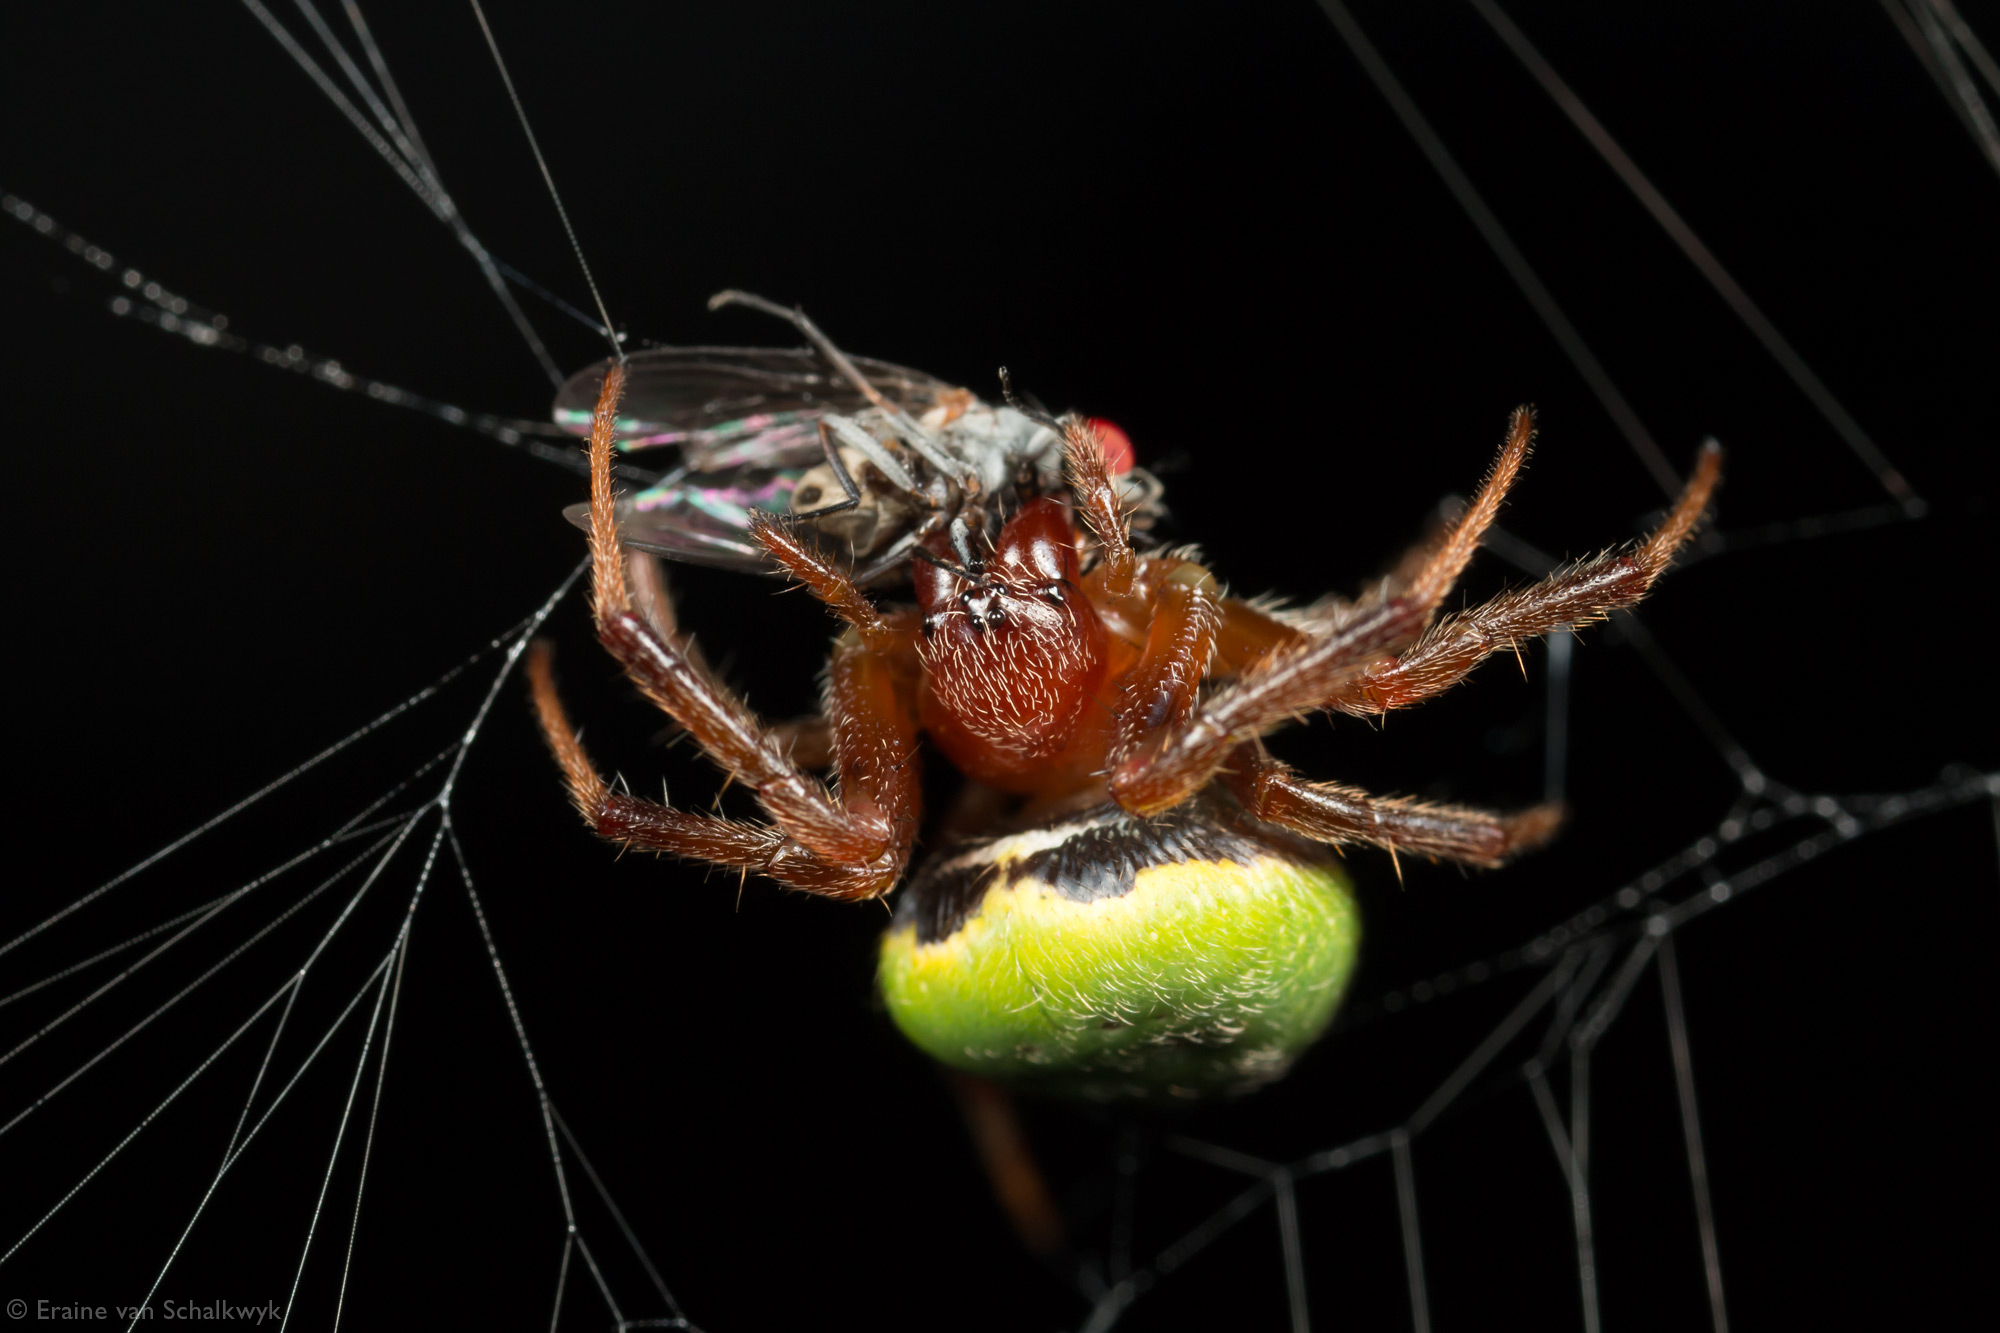 Green pea spider with prey, spider, arachnid, macro photography